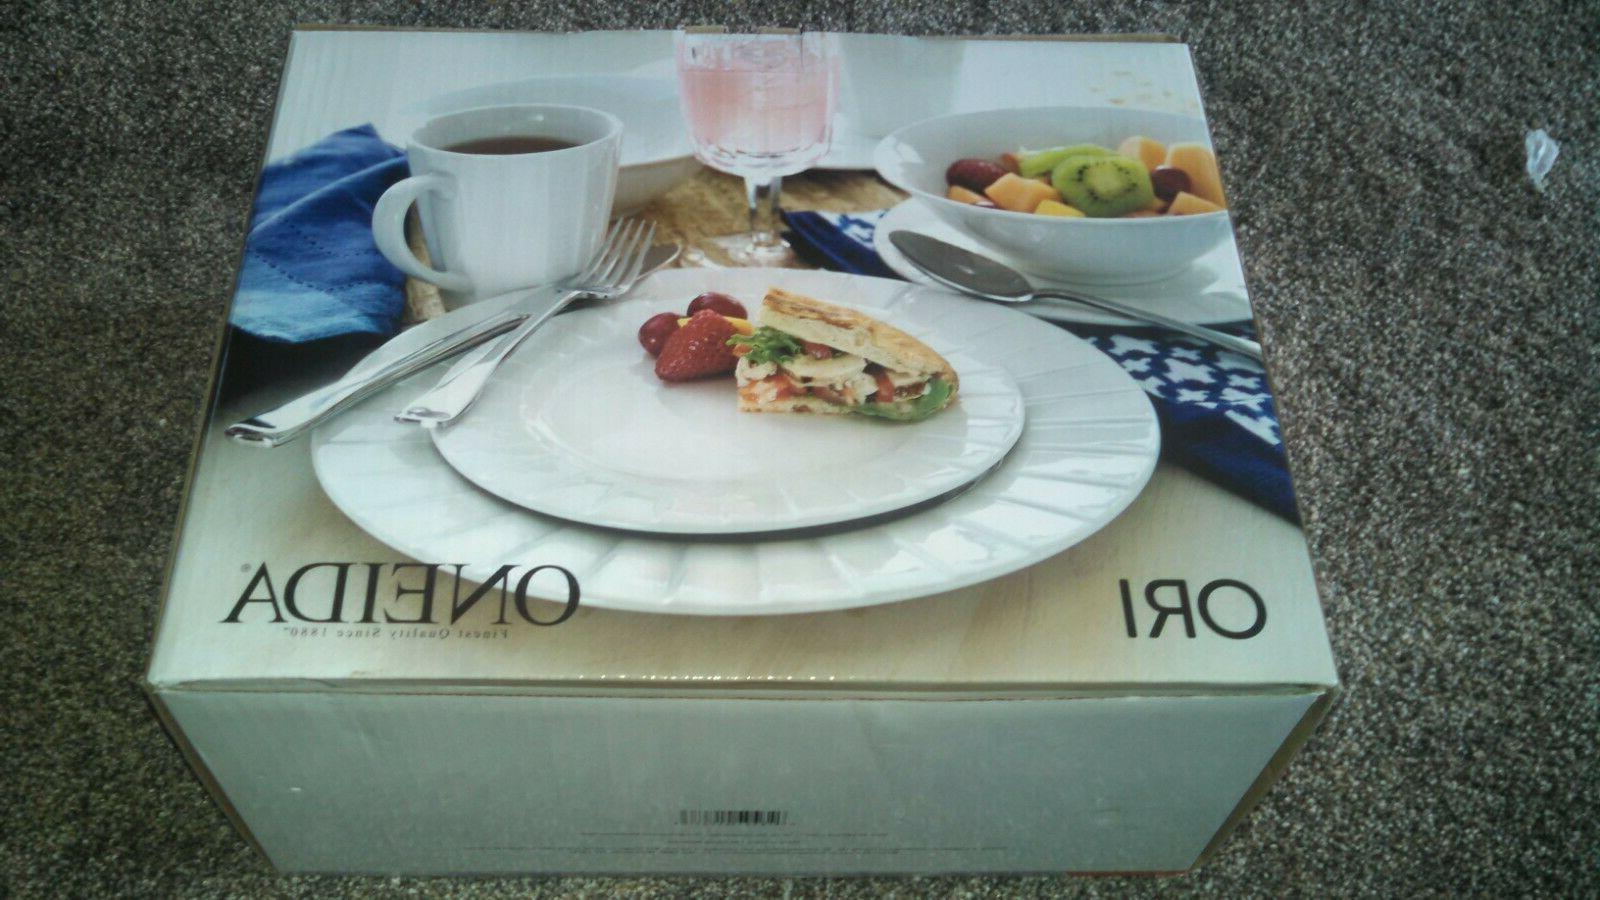 ori d185916 16 pc porcelain dinnerware set